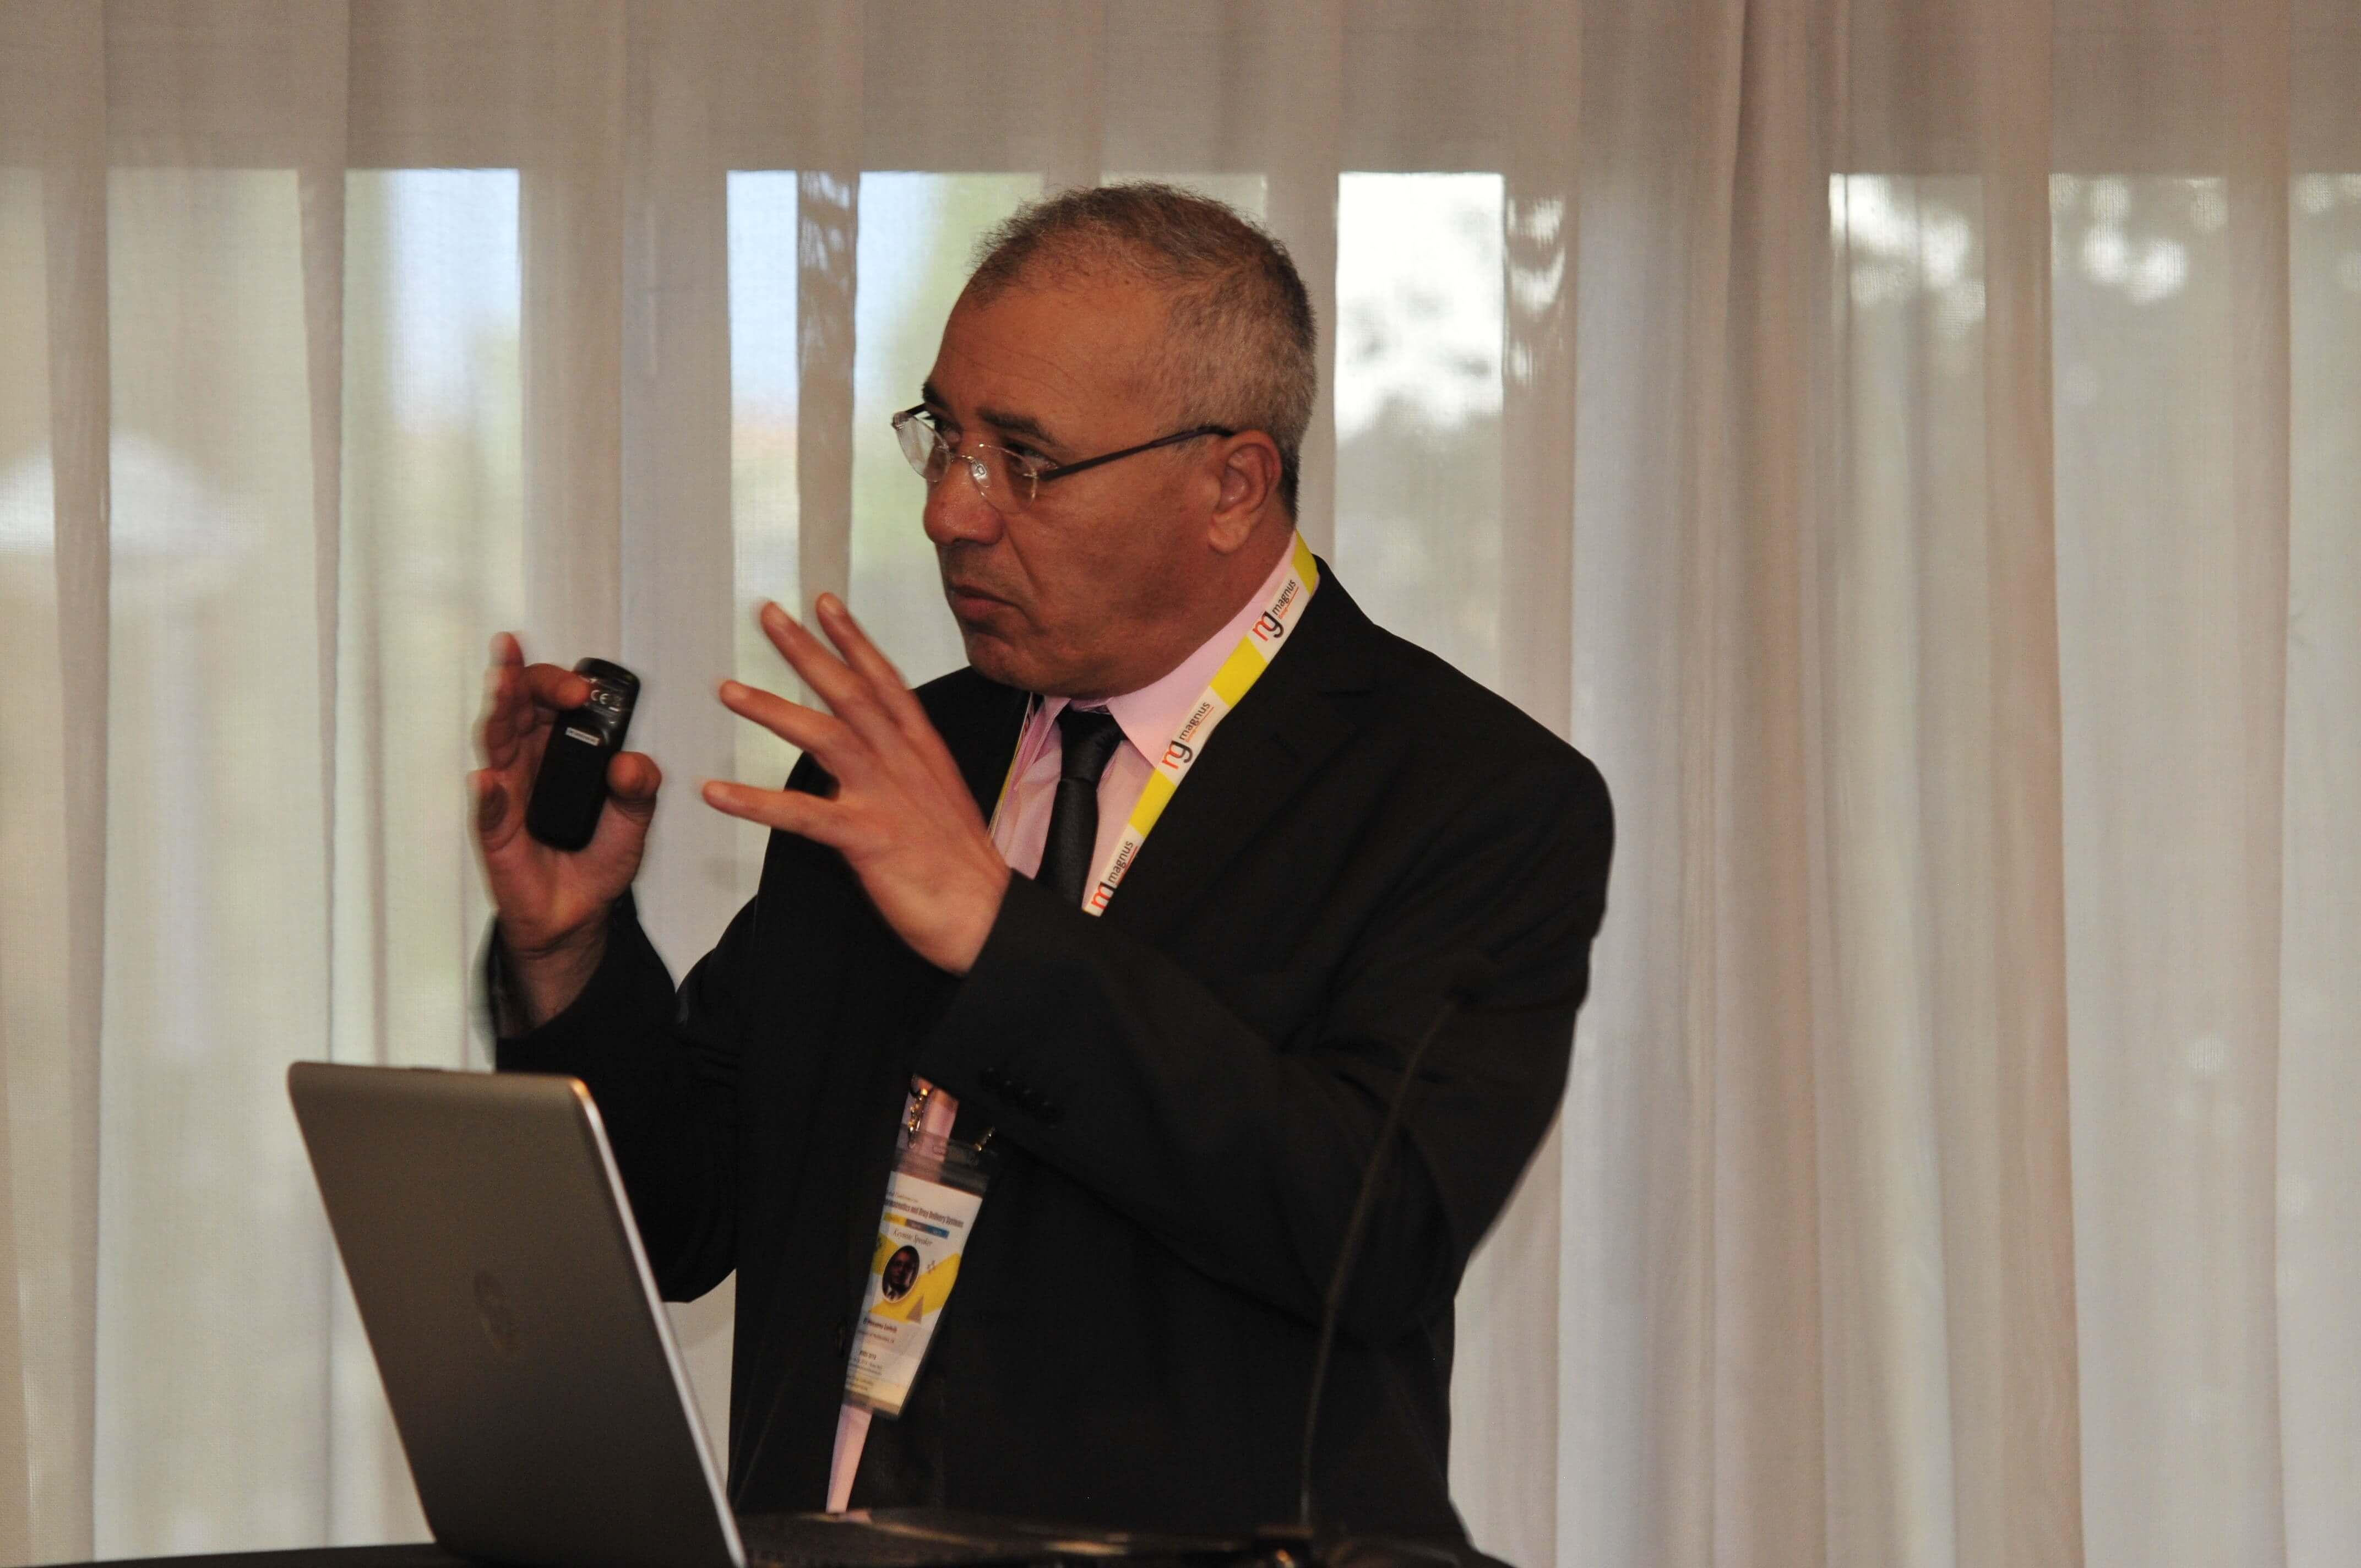 Potential speakers for Pharma Conferences 2020-El Hassane Larhrib